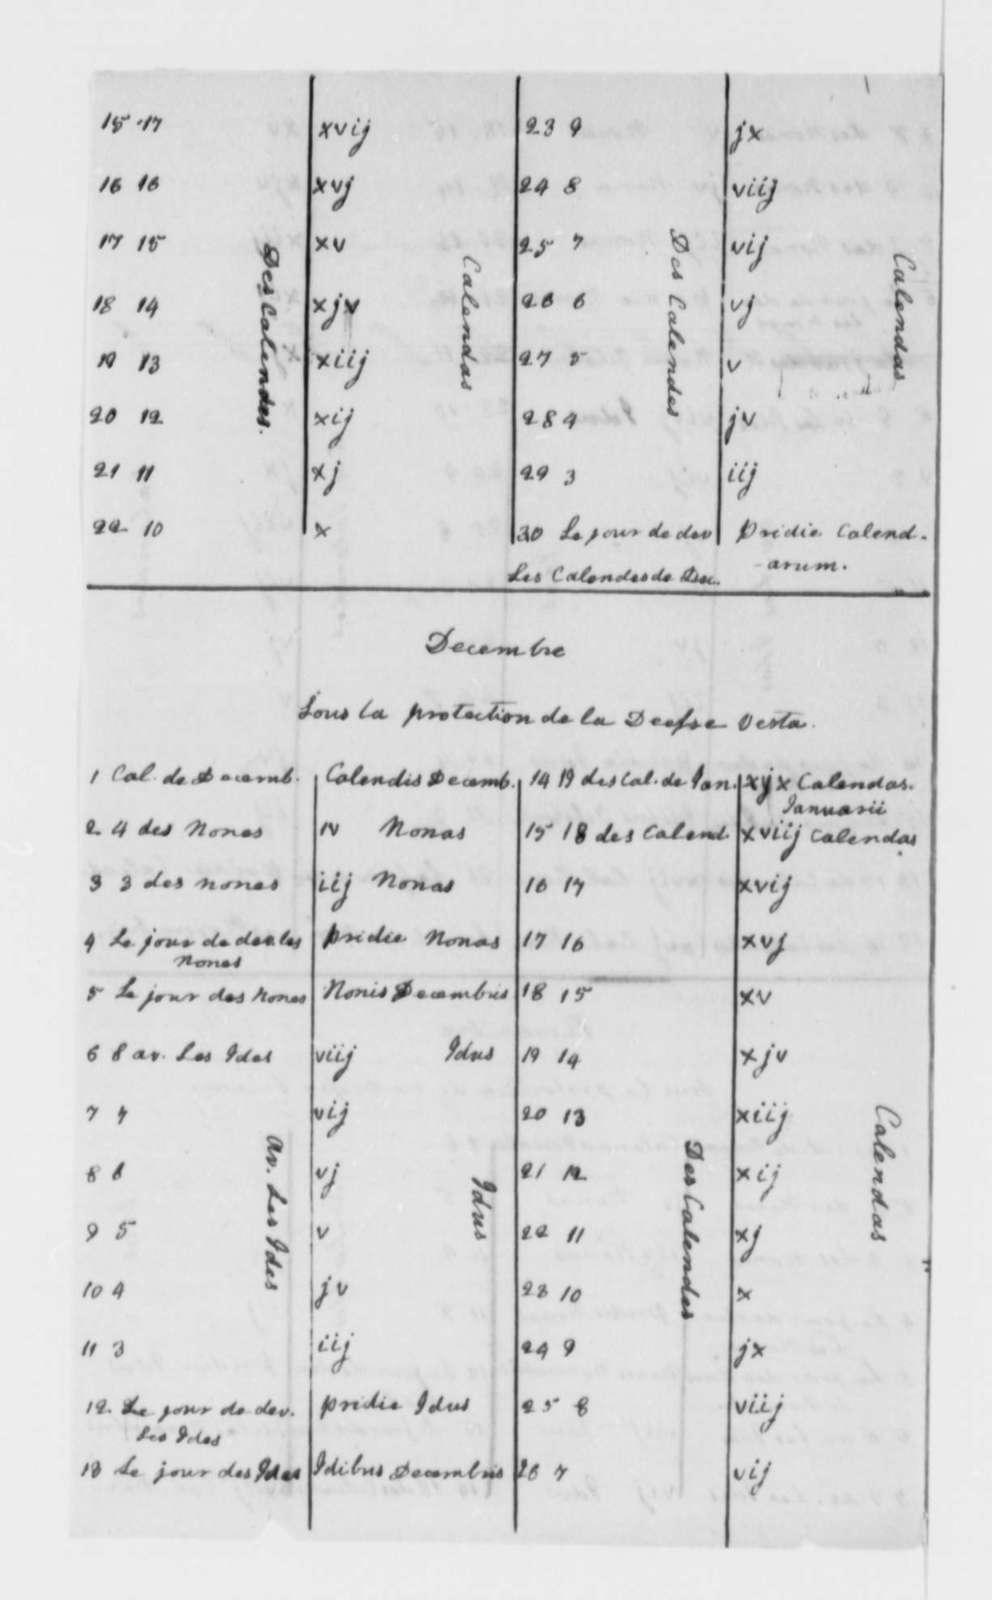 Roman Numerals and Calendar, no date